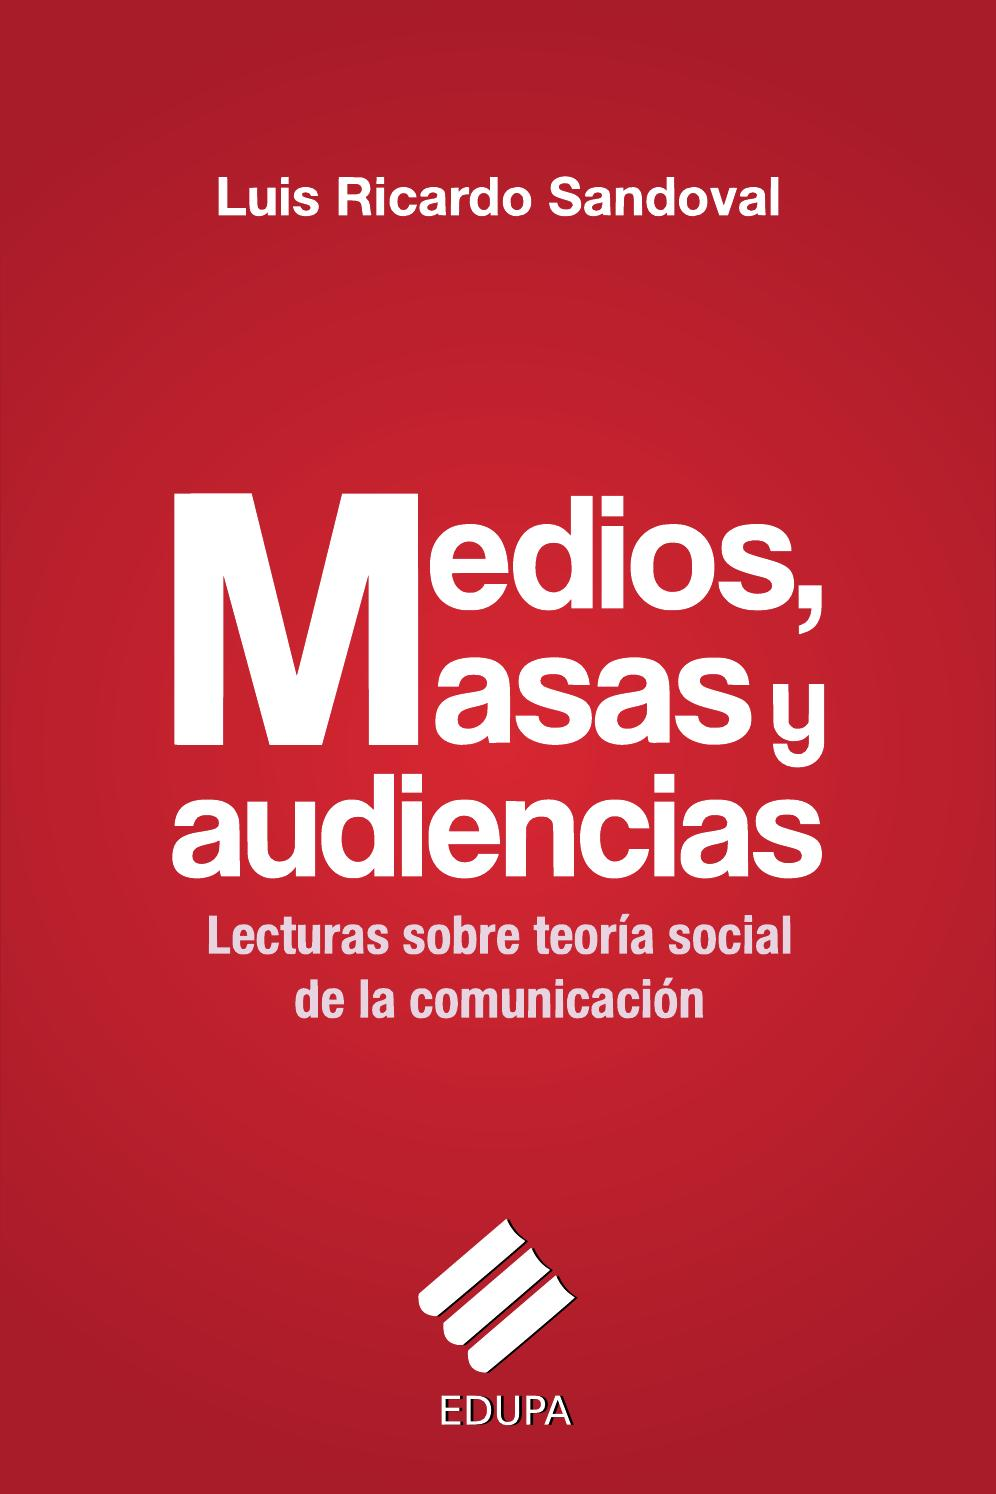 Sandoval medios masas audienciasfinal by Florcicimino - issuu